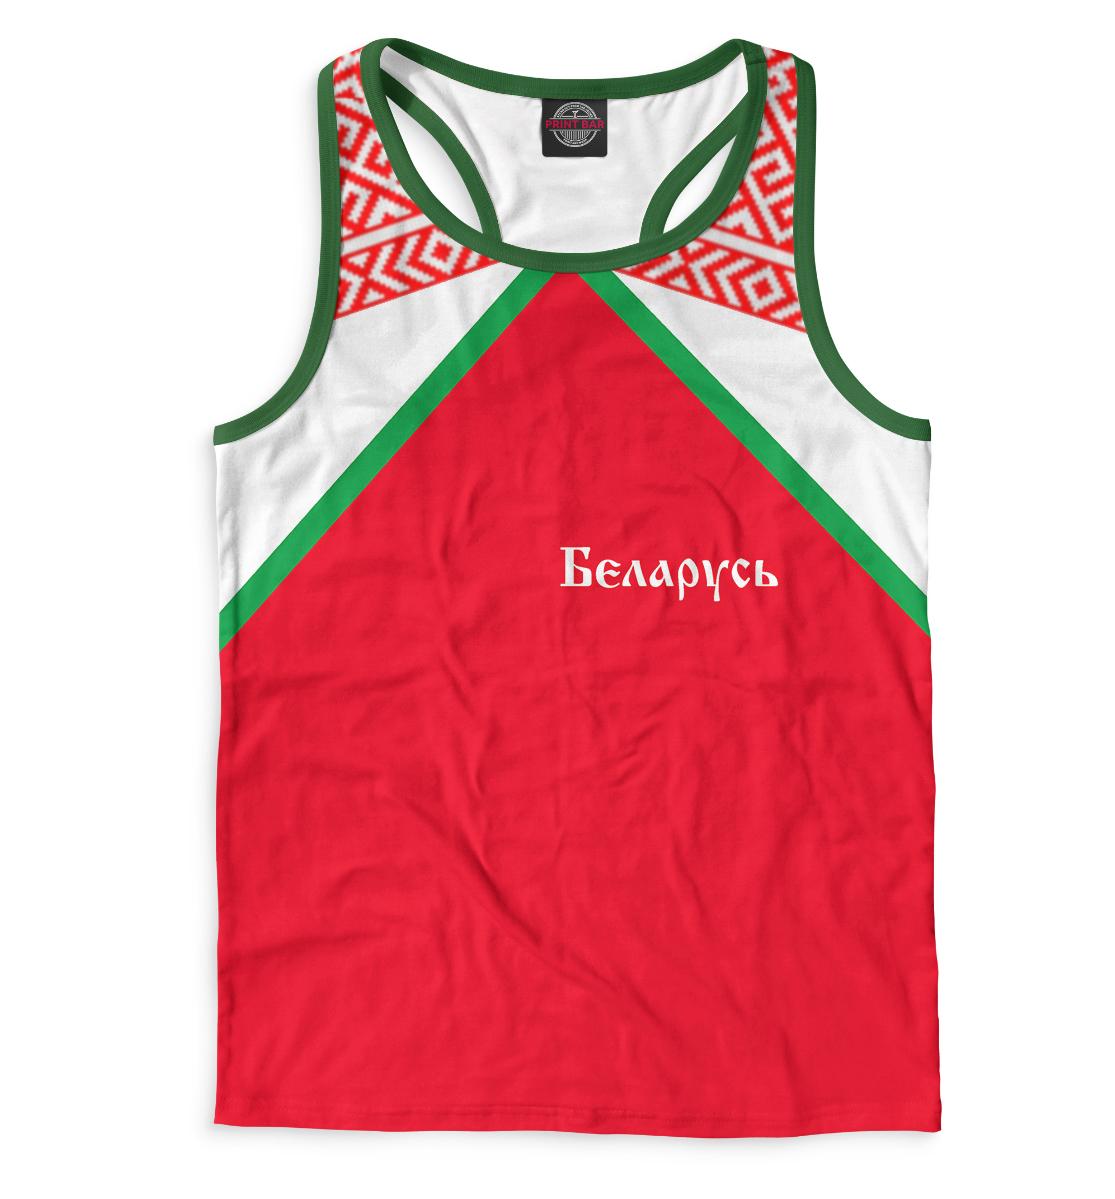 Купить Беларусь, Printbar, Майки борцовки, BLR-135830-mayb-2